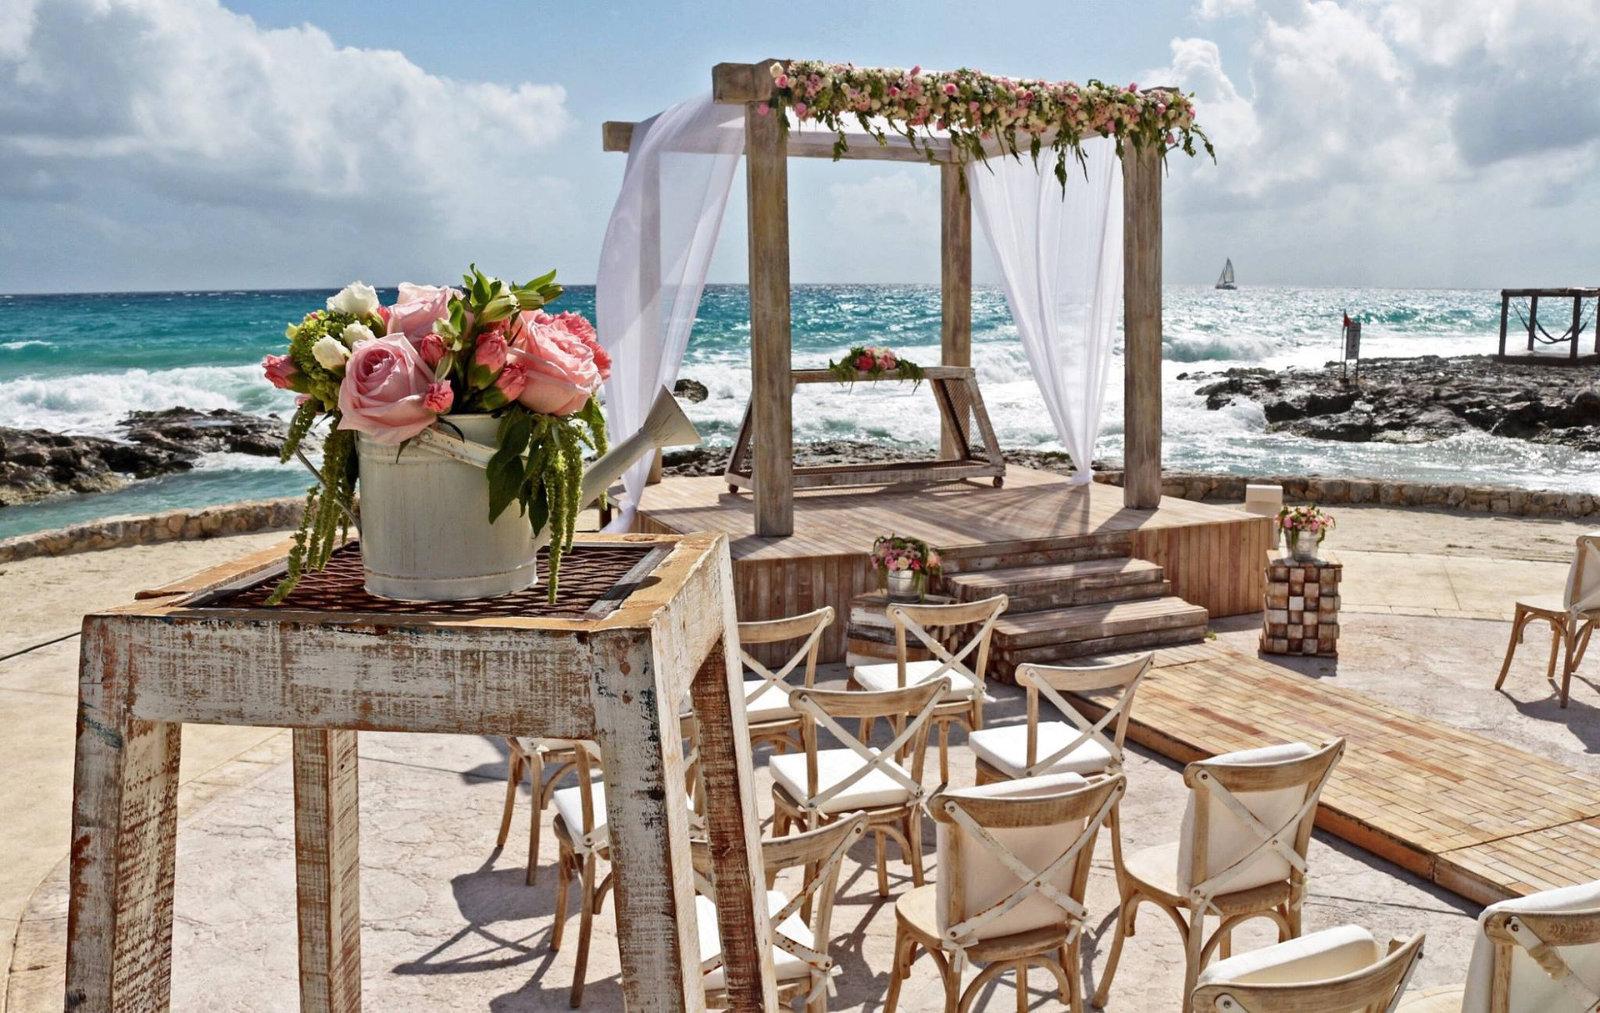 beach-wedding-rustic.jpg